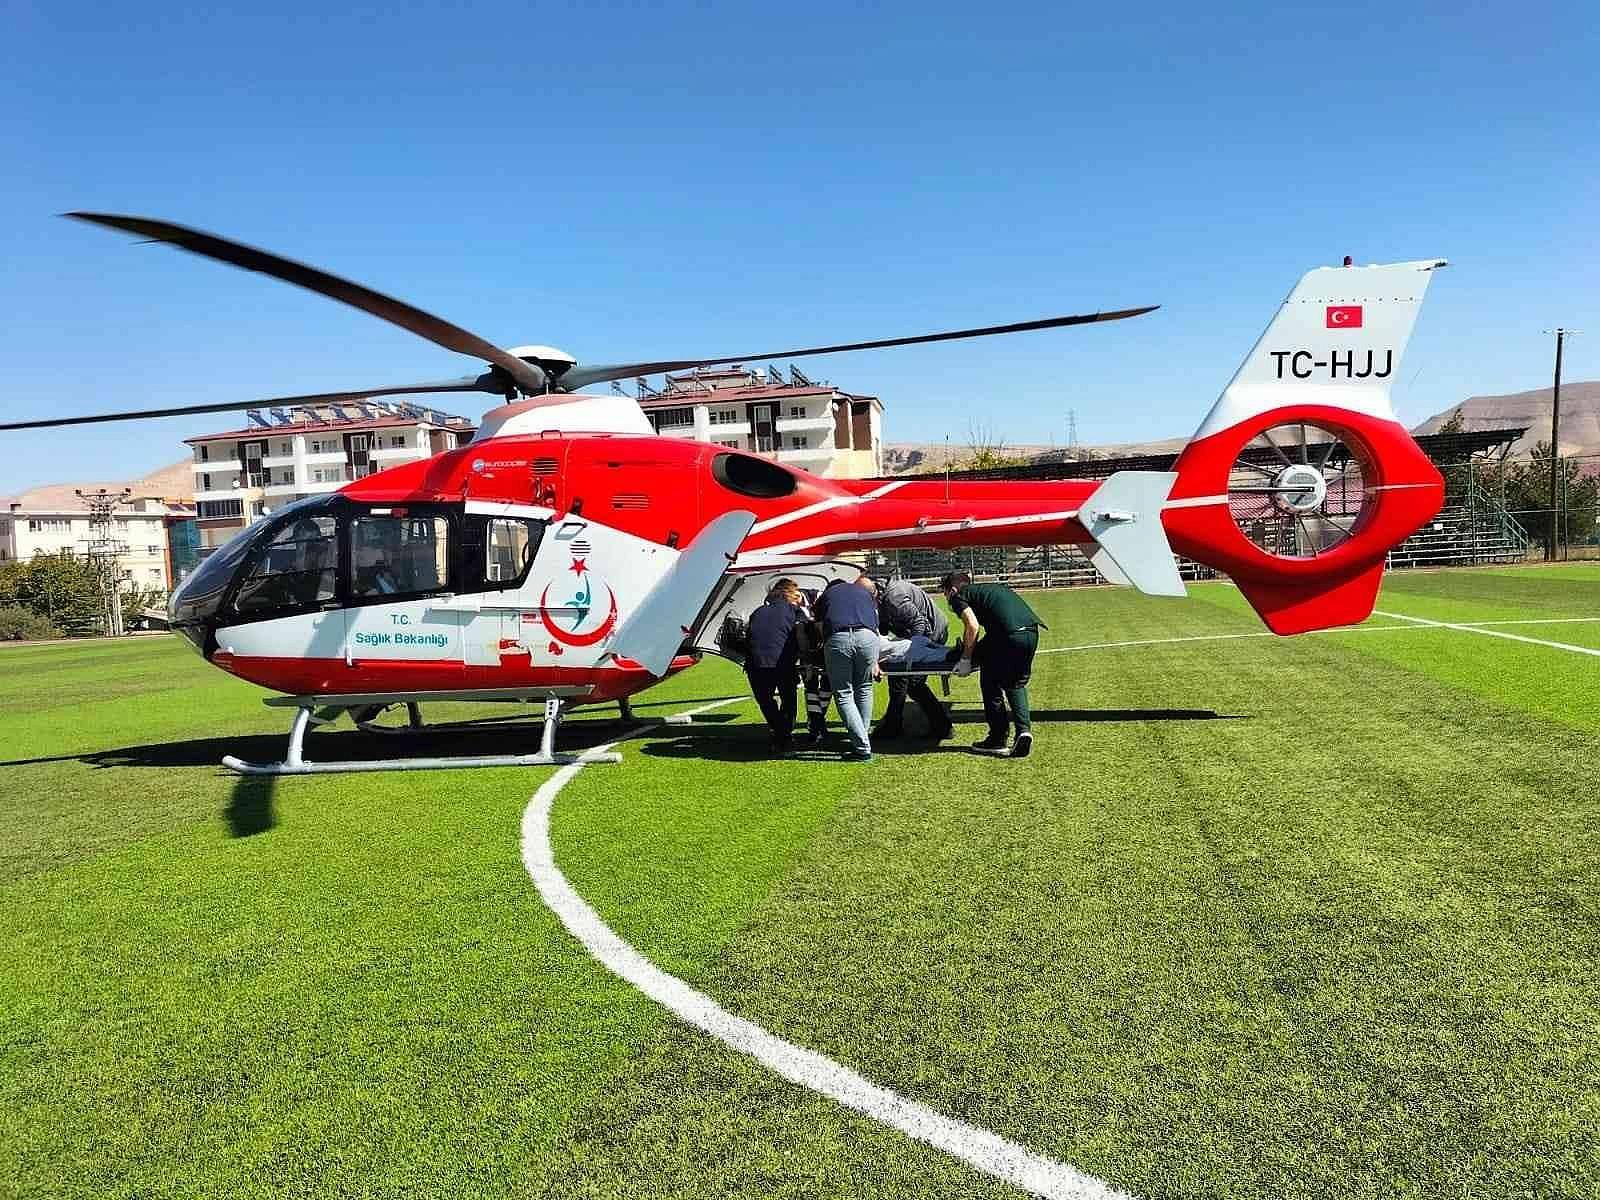 2021/10/ambulans-helikopter-kalp-krizi-geciren-hasta-icin-havalandi-20211012AW43-2.jpg